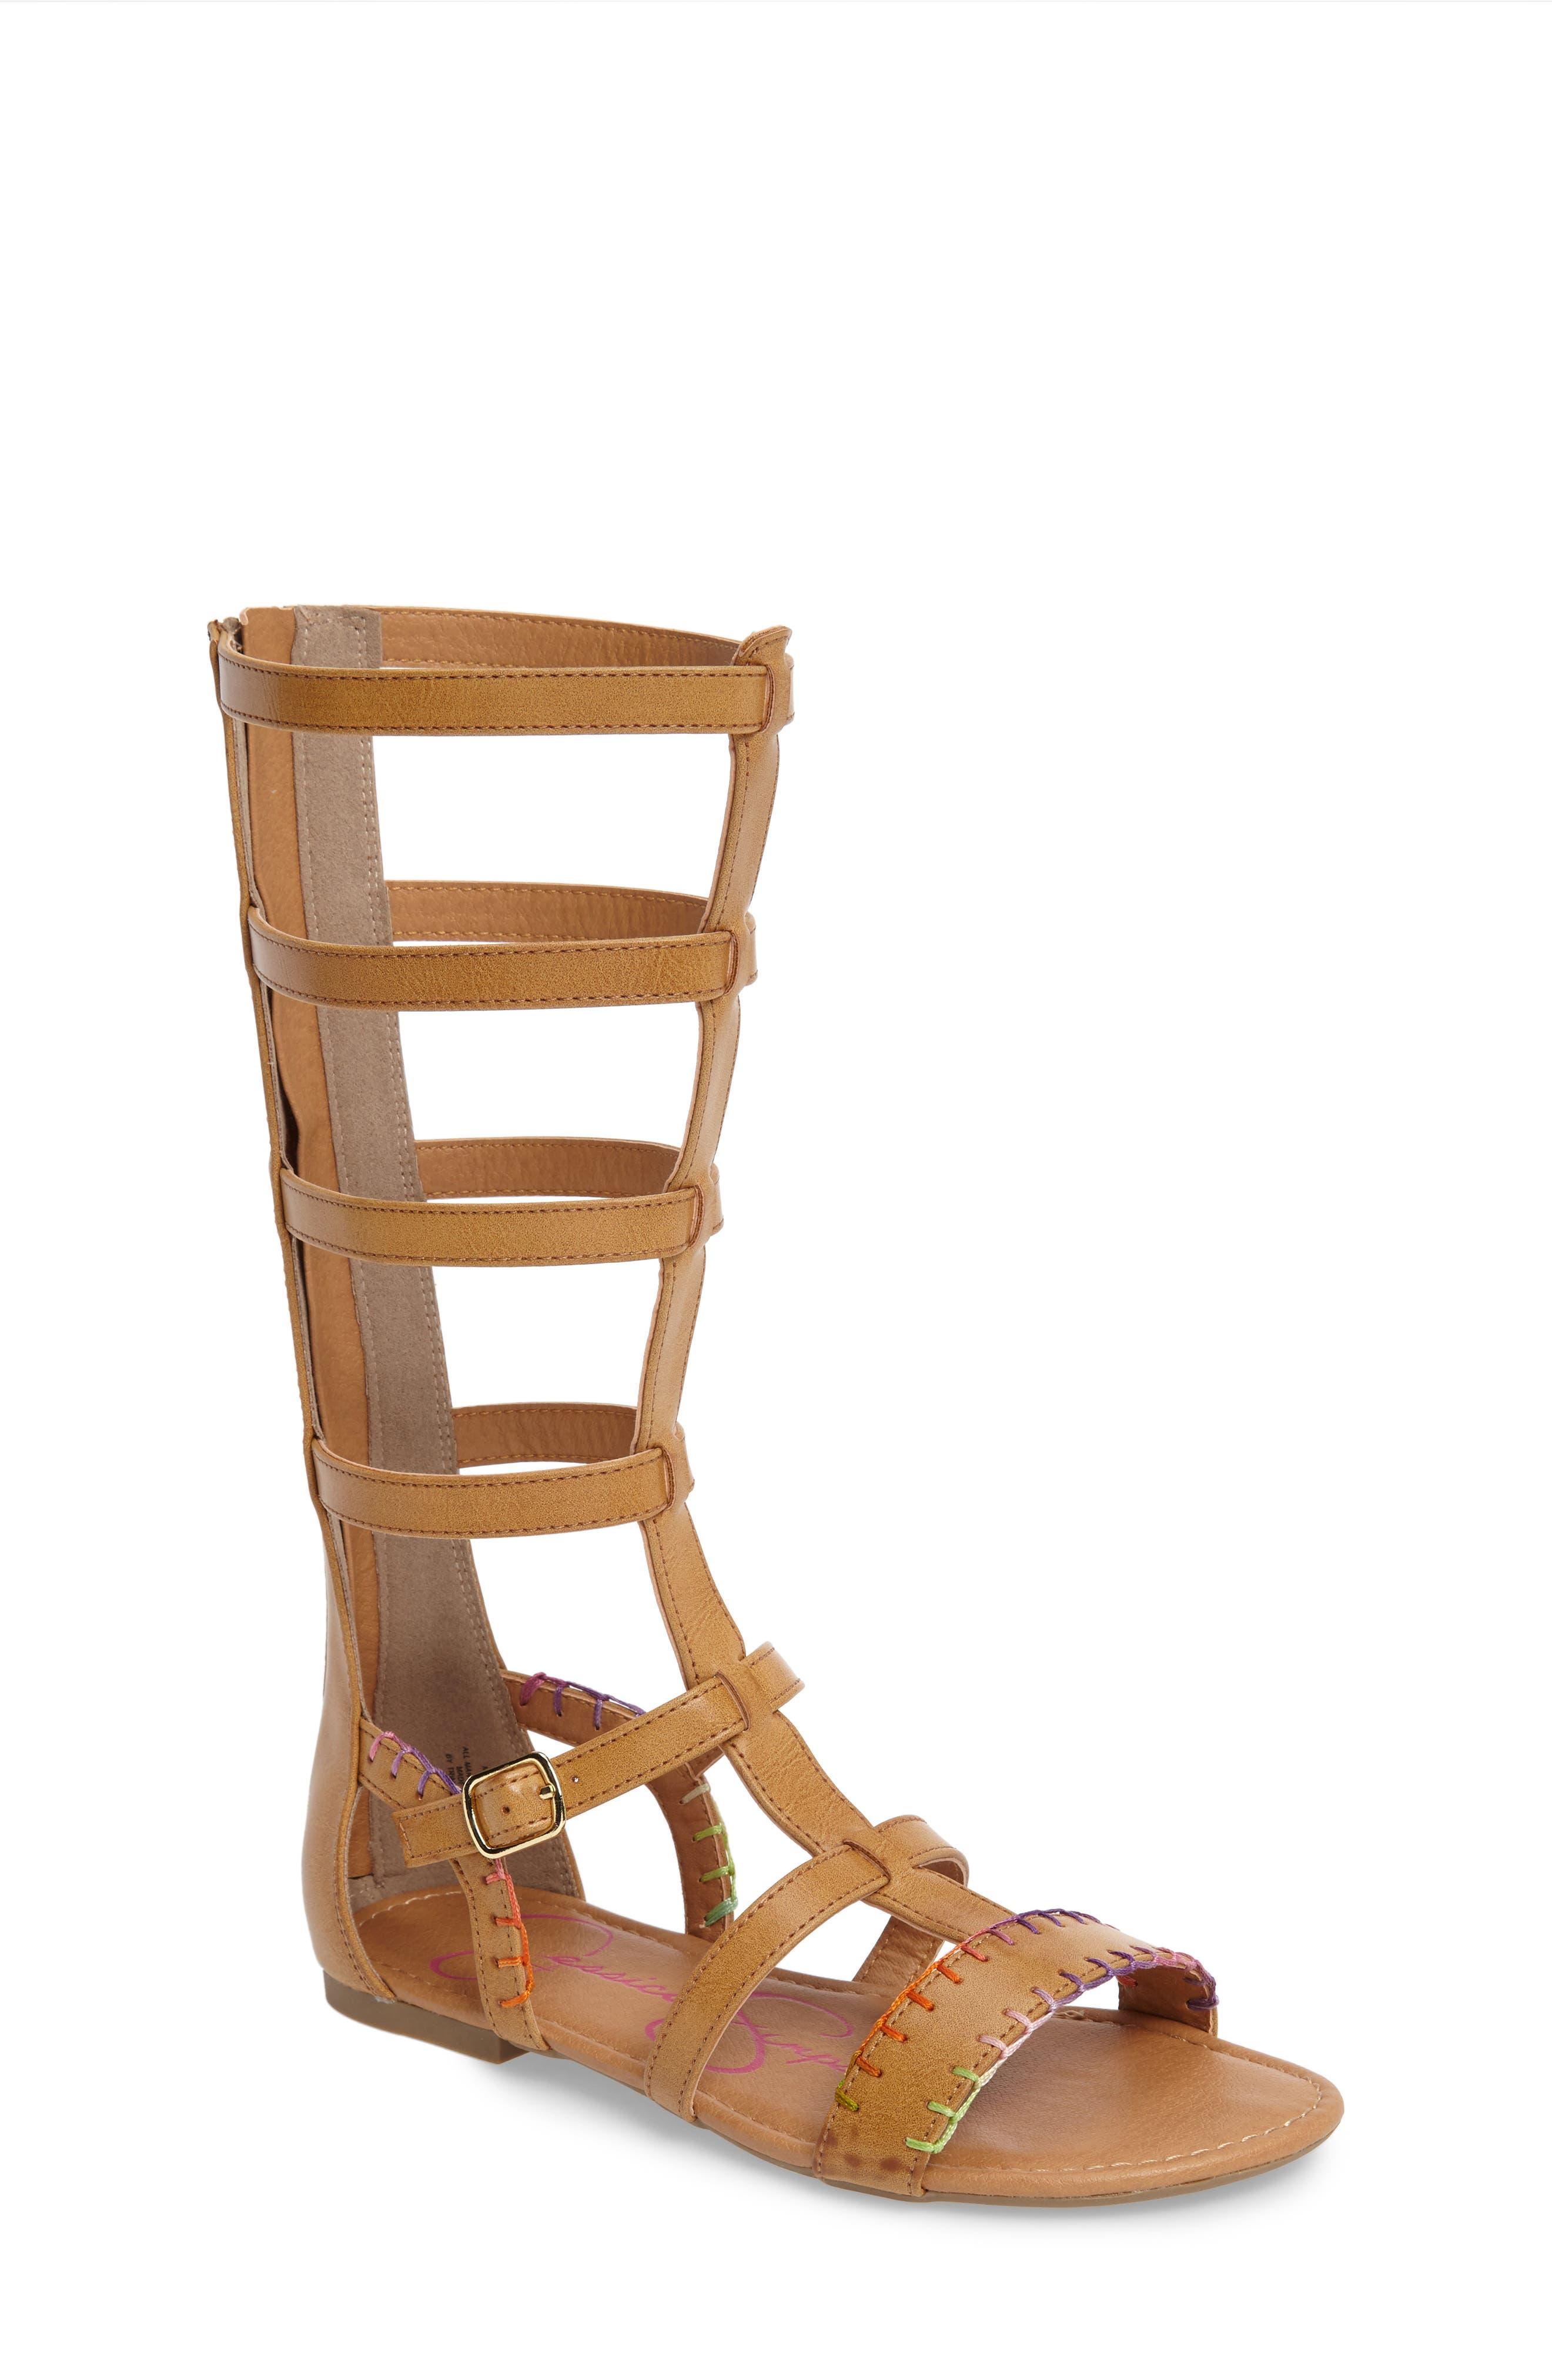 JESSICA SIMPSON Dorinda Gladiator Sandal